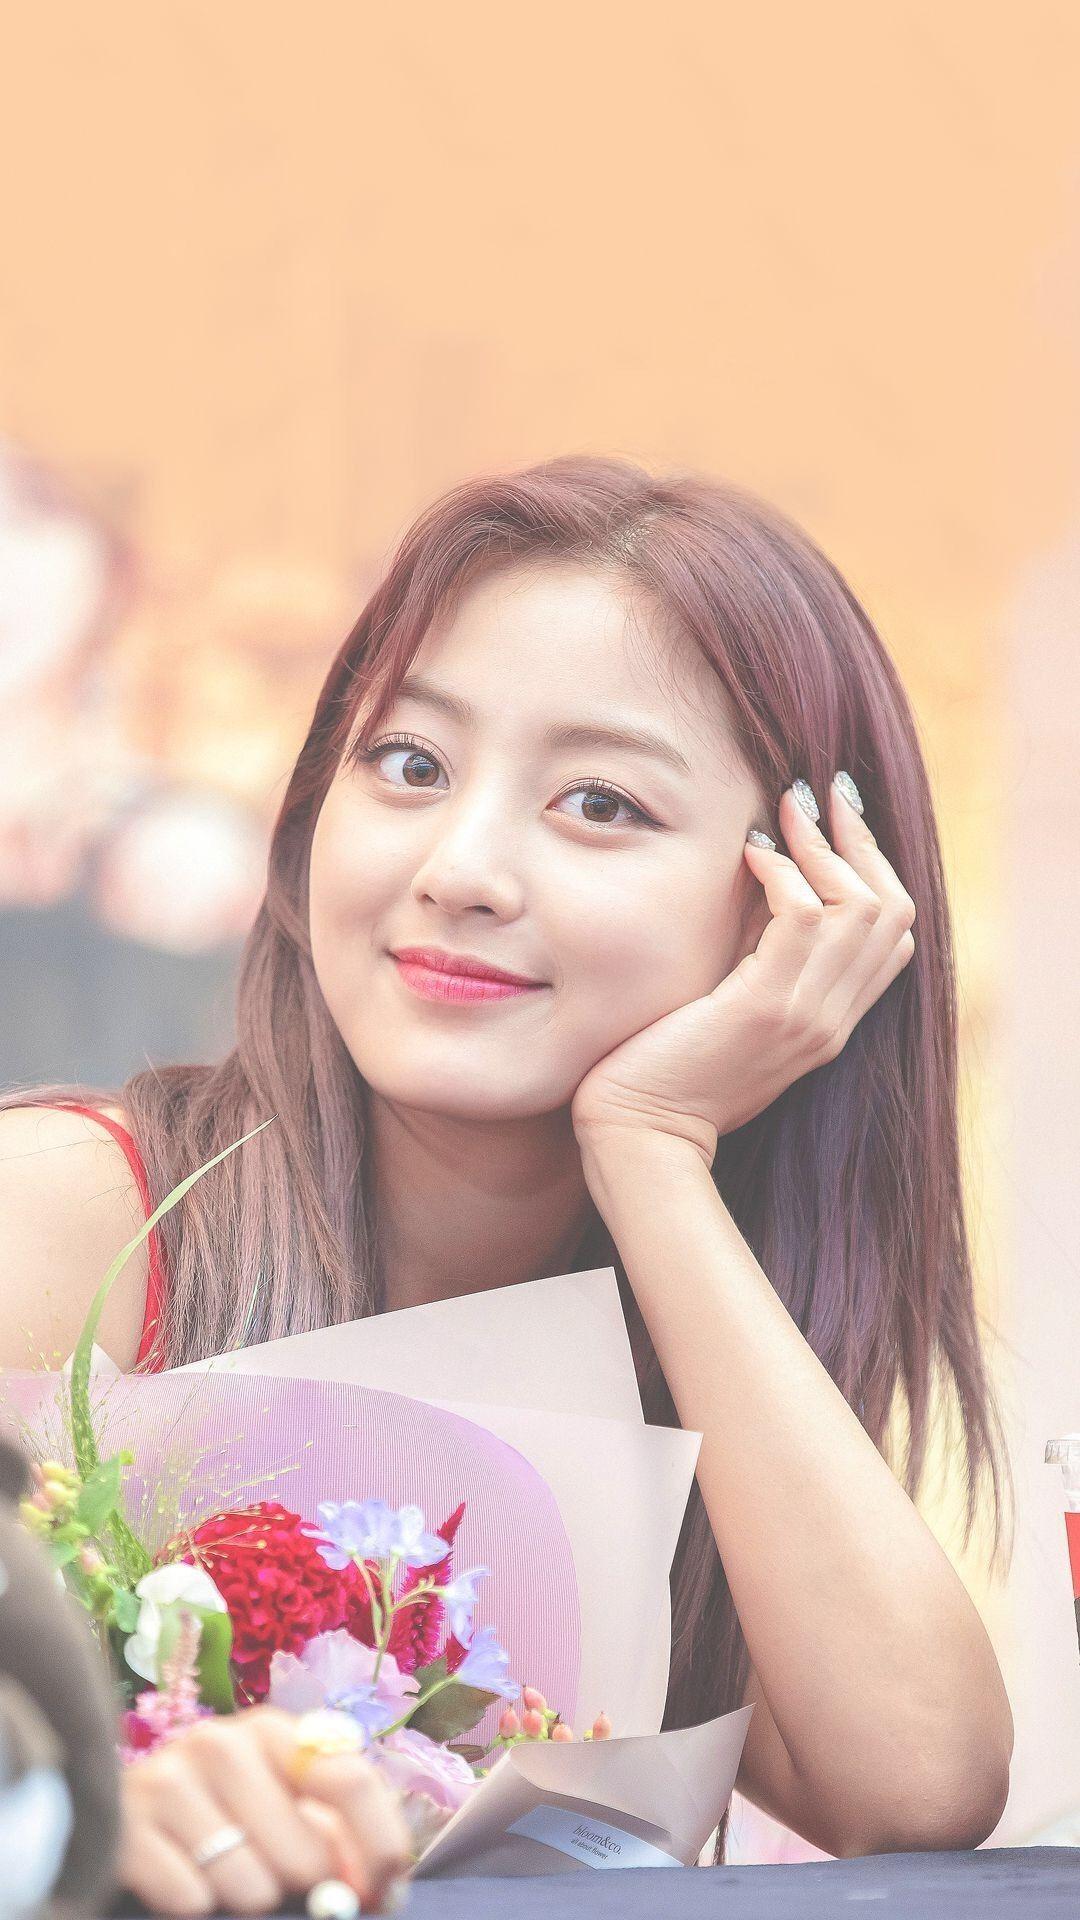 Park Ji-hyo Park Seo-yeon : ji-hyo, seo-yeon, Sakhumzi, Thozamile, (((Jihyo┇지효))), Twice, Jihyo,, Seung, Yeon,